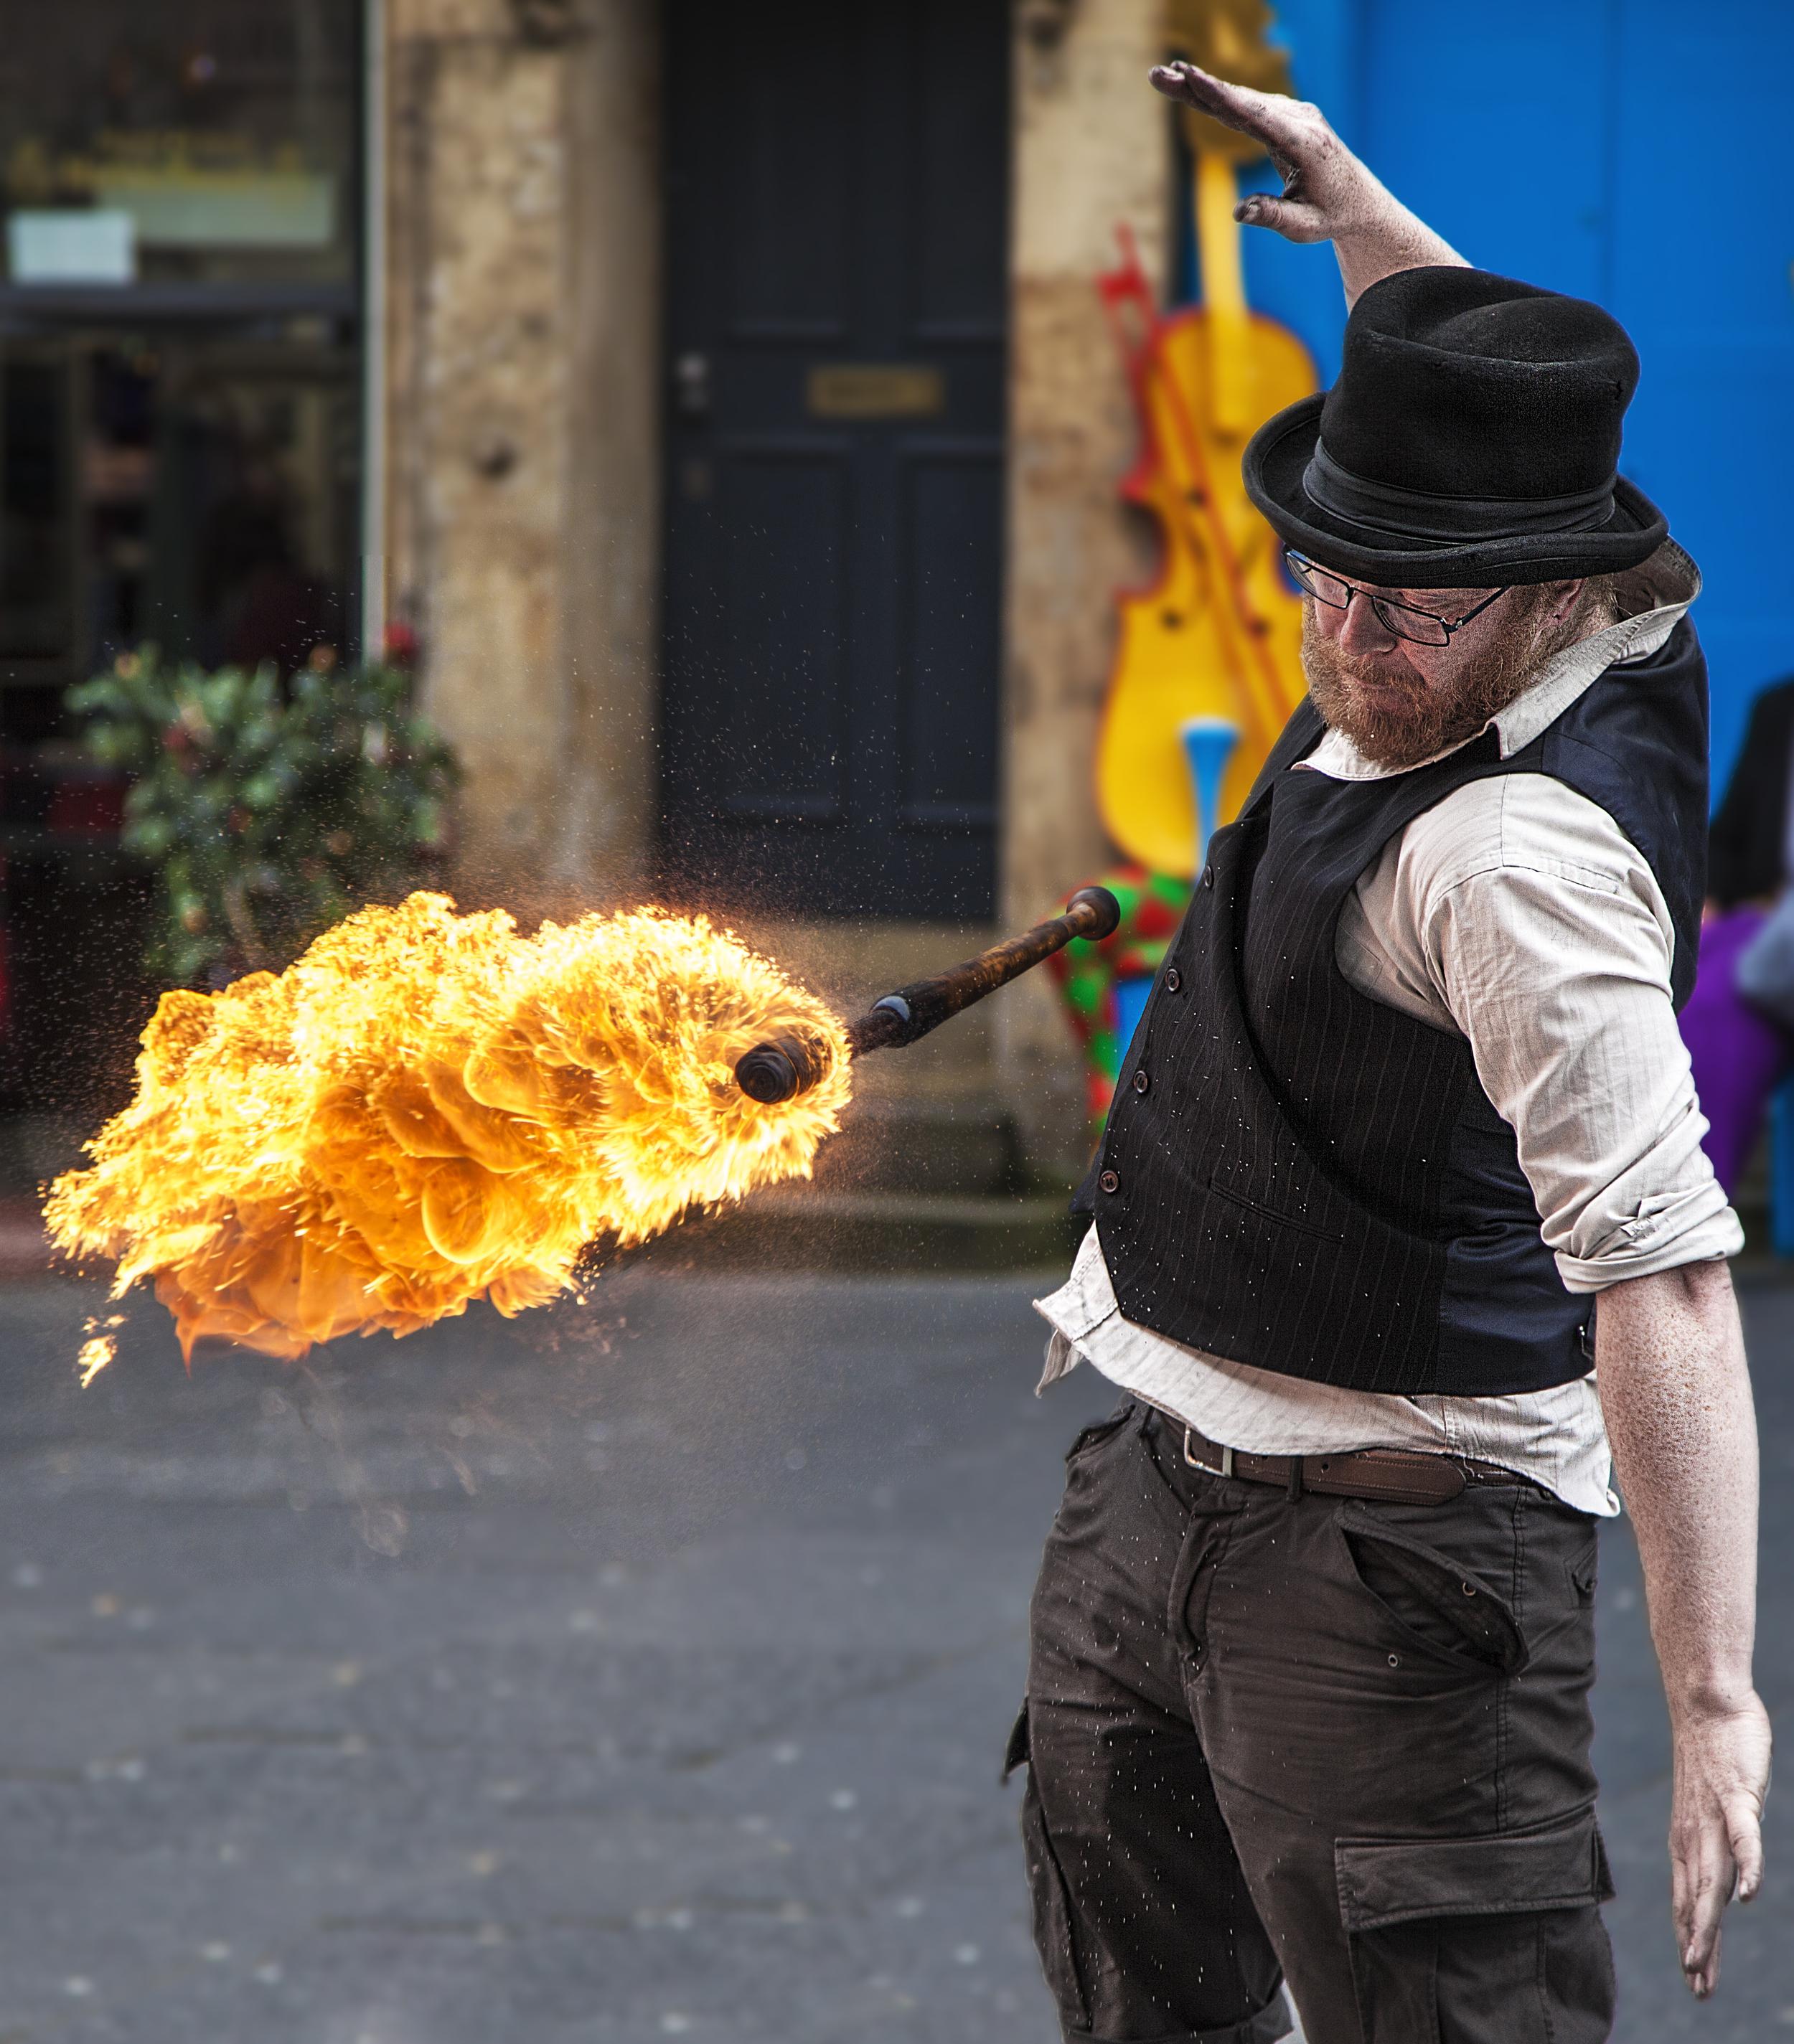 Fire guy 3.jpg